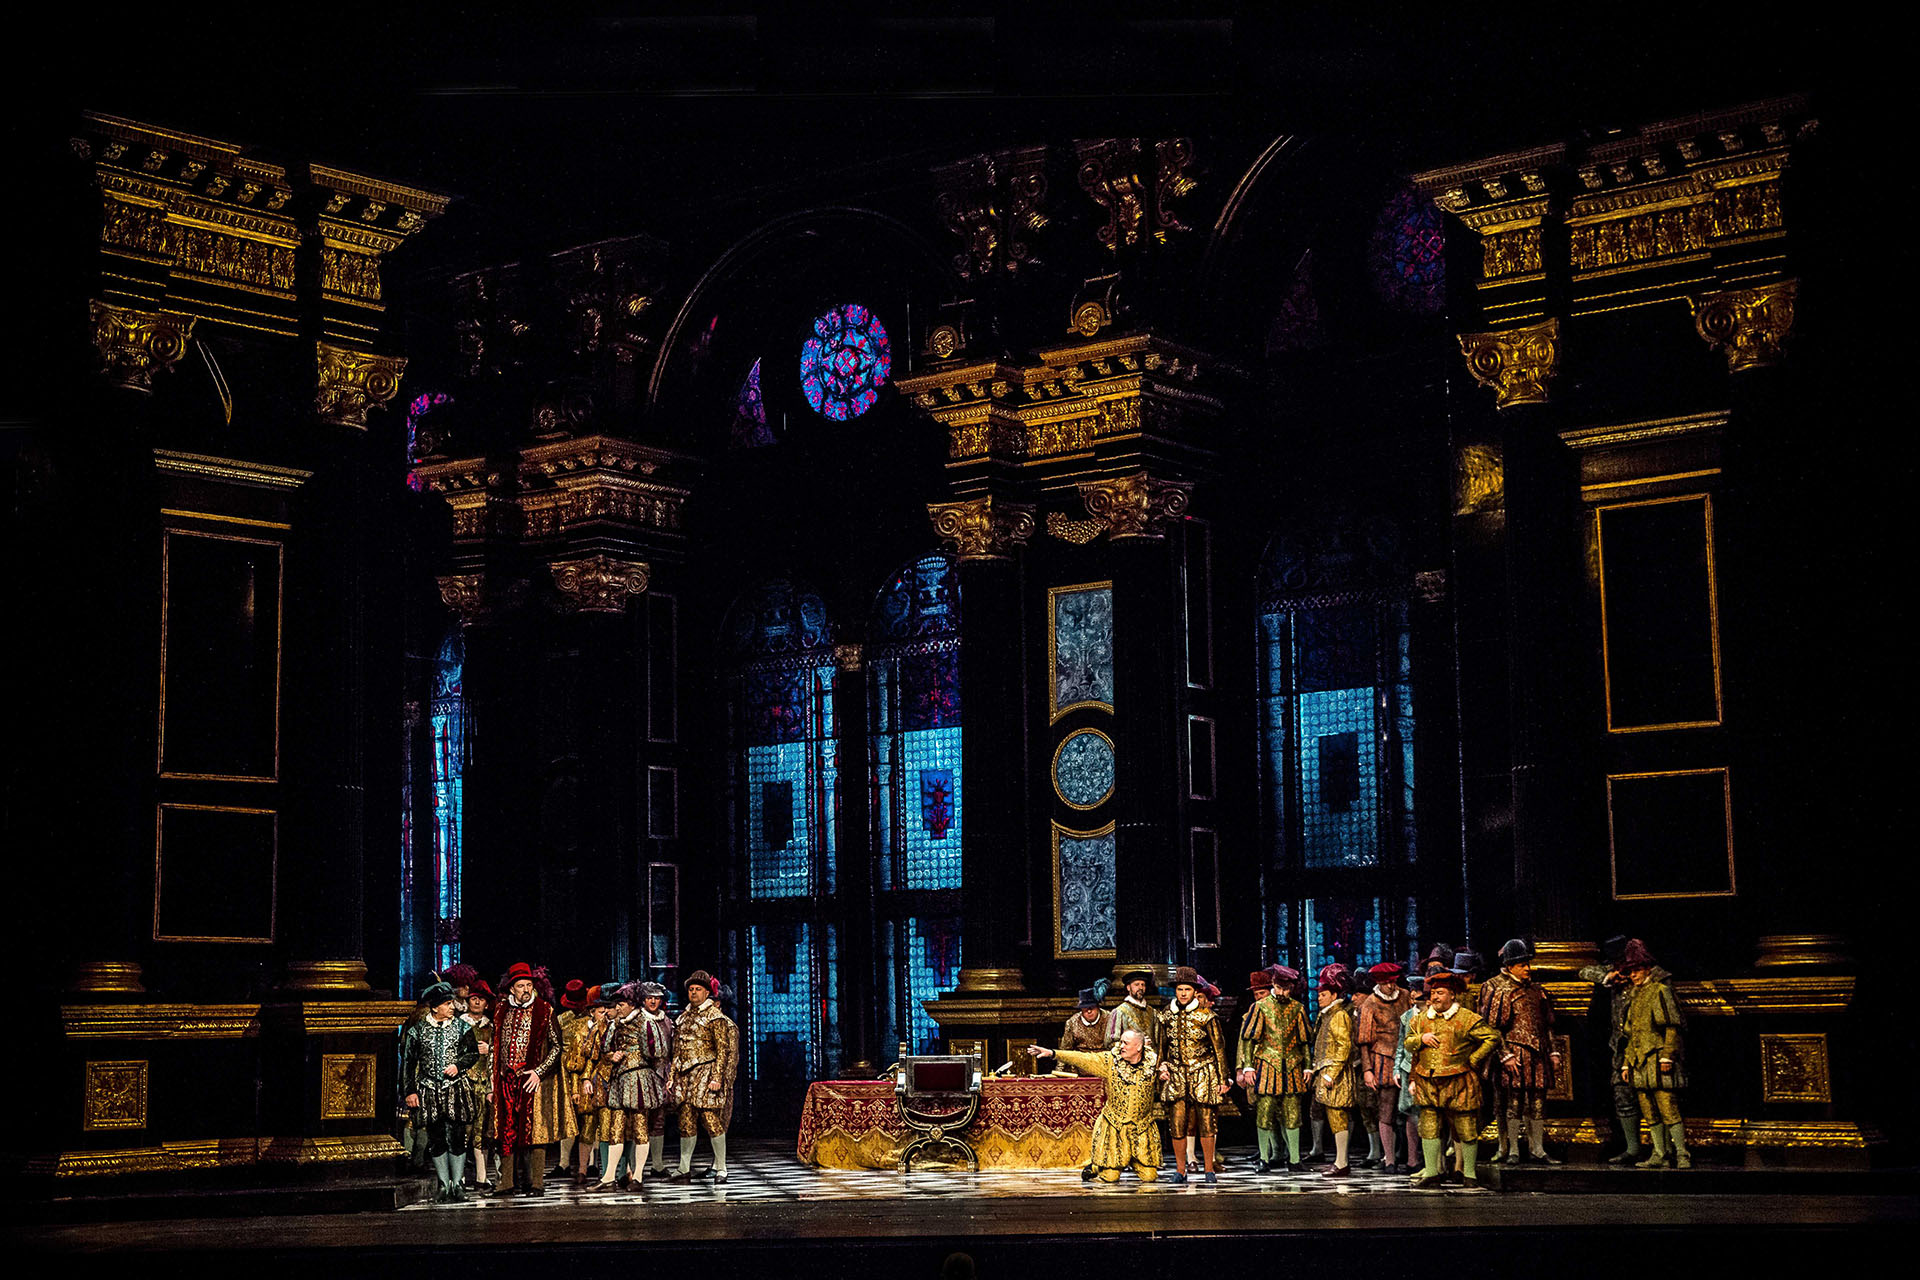 Rigoletto, akt II reż. Opera Narodowa, foto. M. Biel